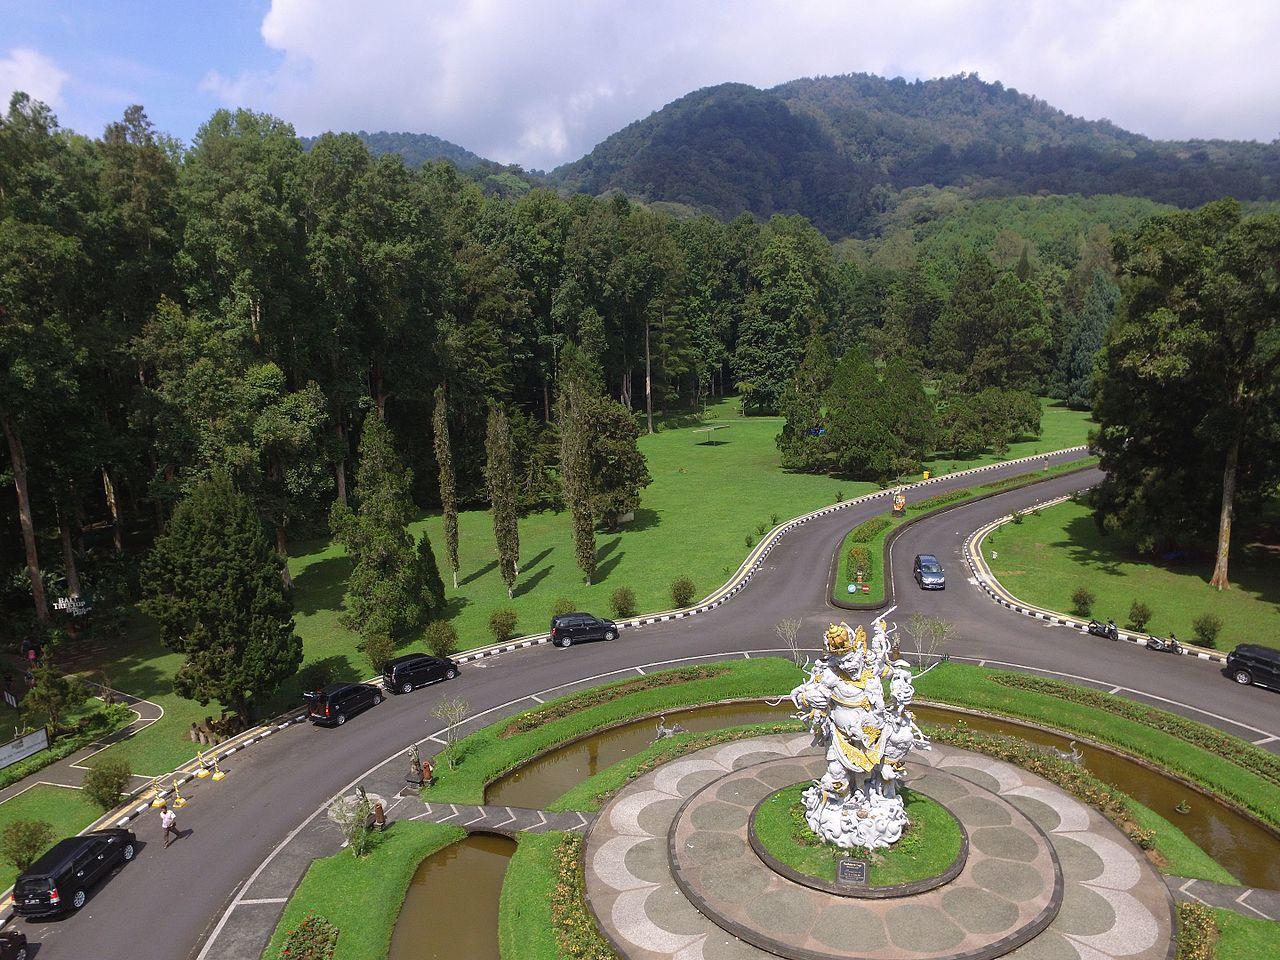 Вид на Ботанический сад Бали в горном районе Бедугул, Индонезия